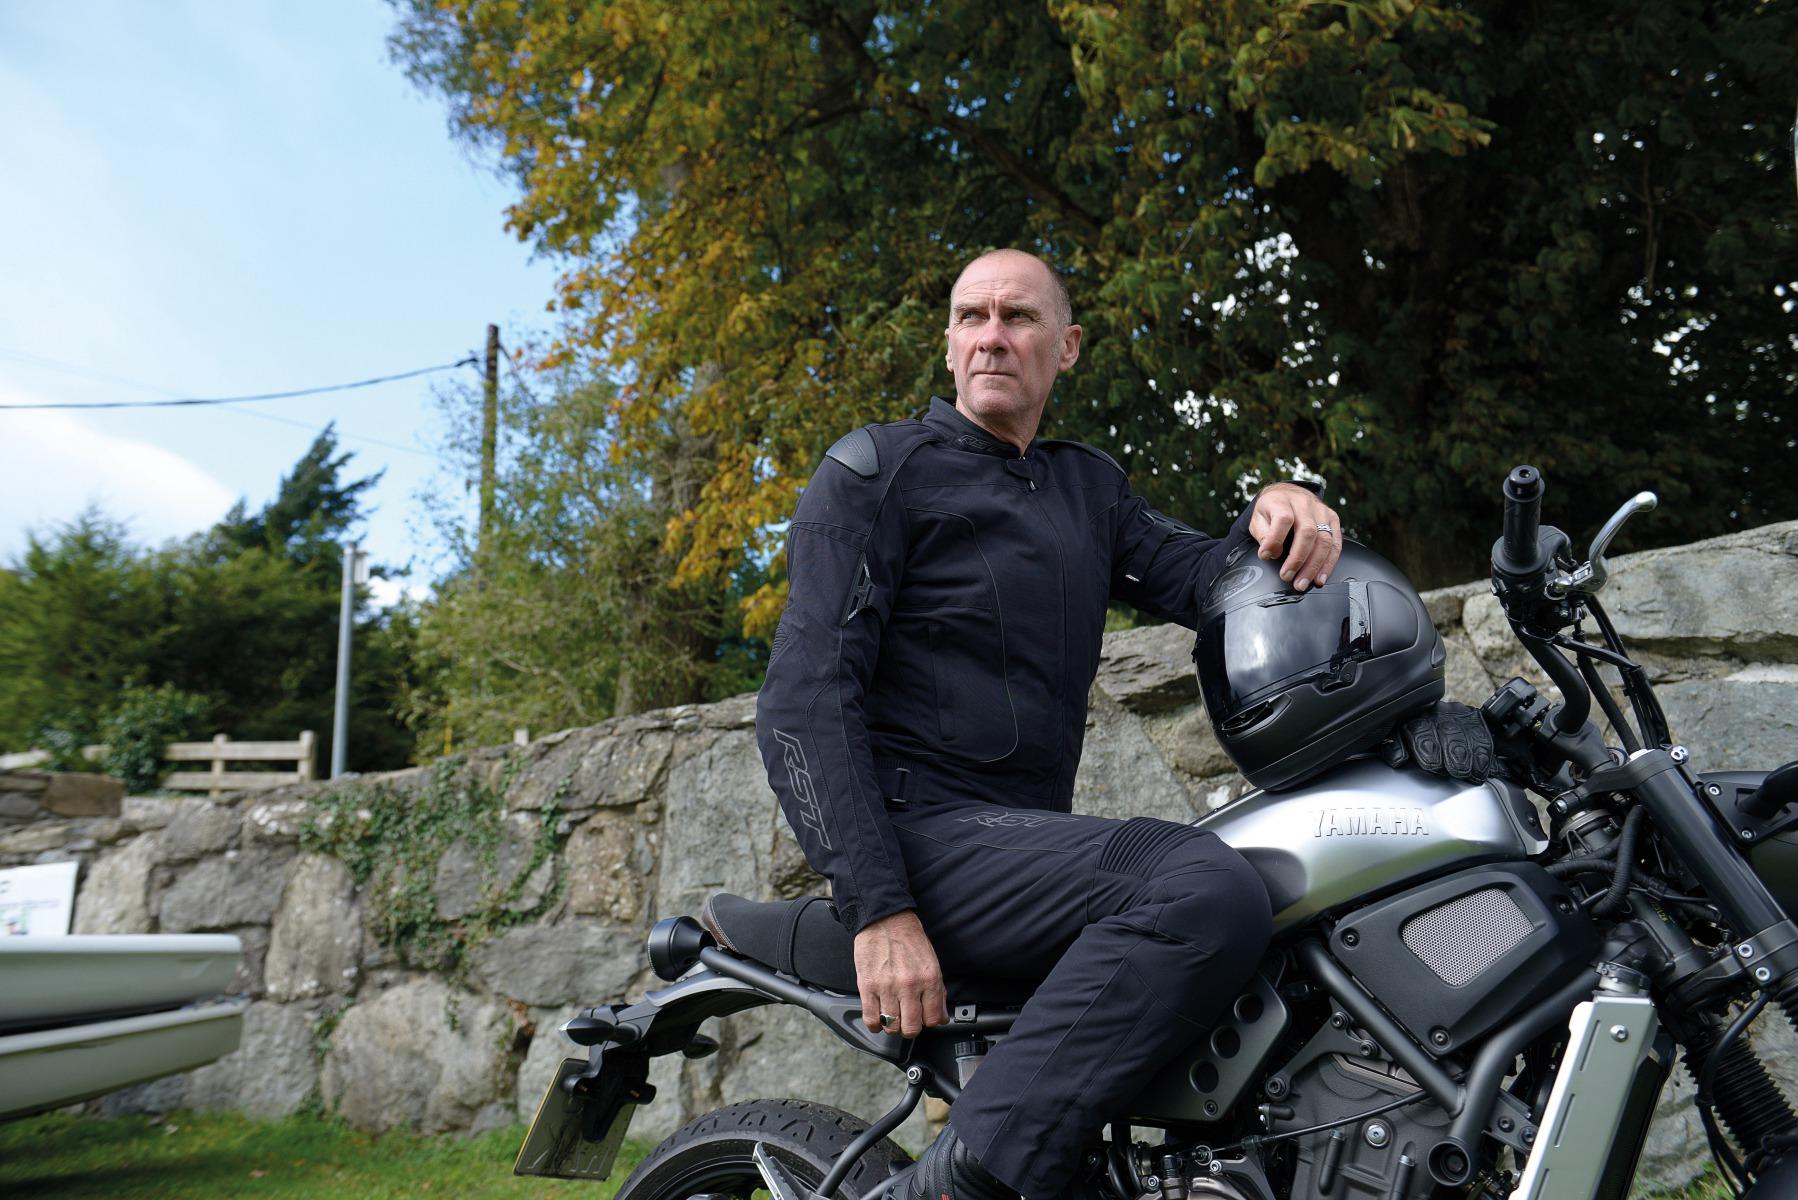 102196-rst-gt-textile-jacket-black-lifestyle-06